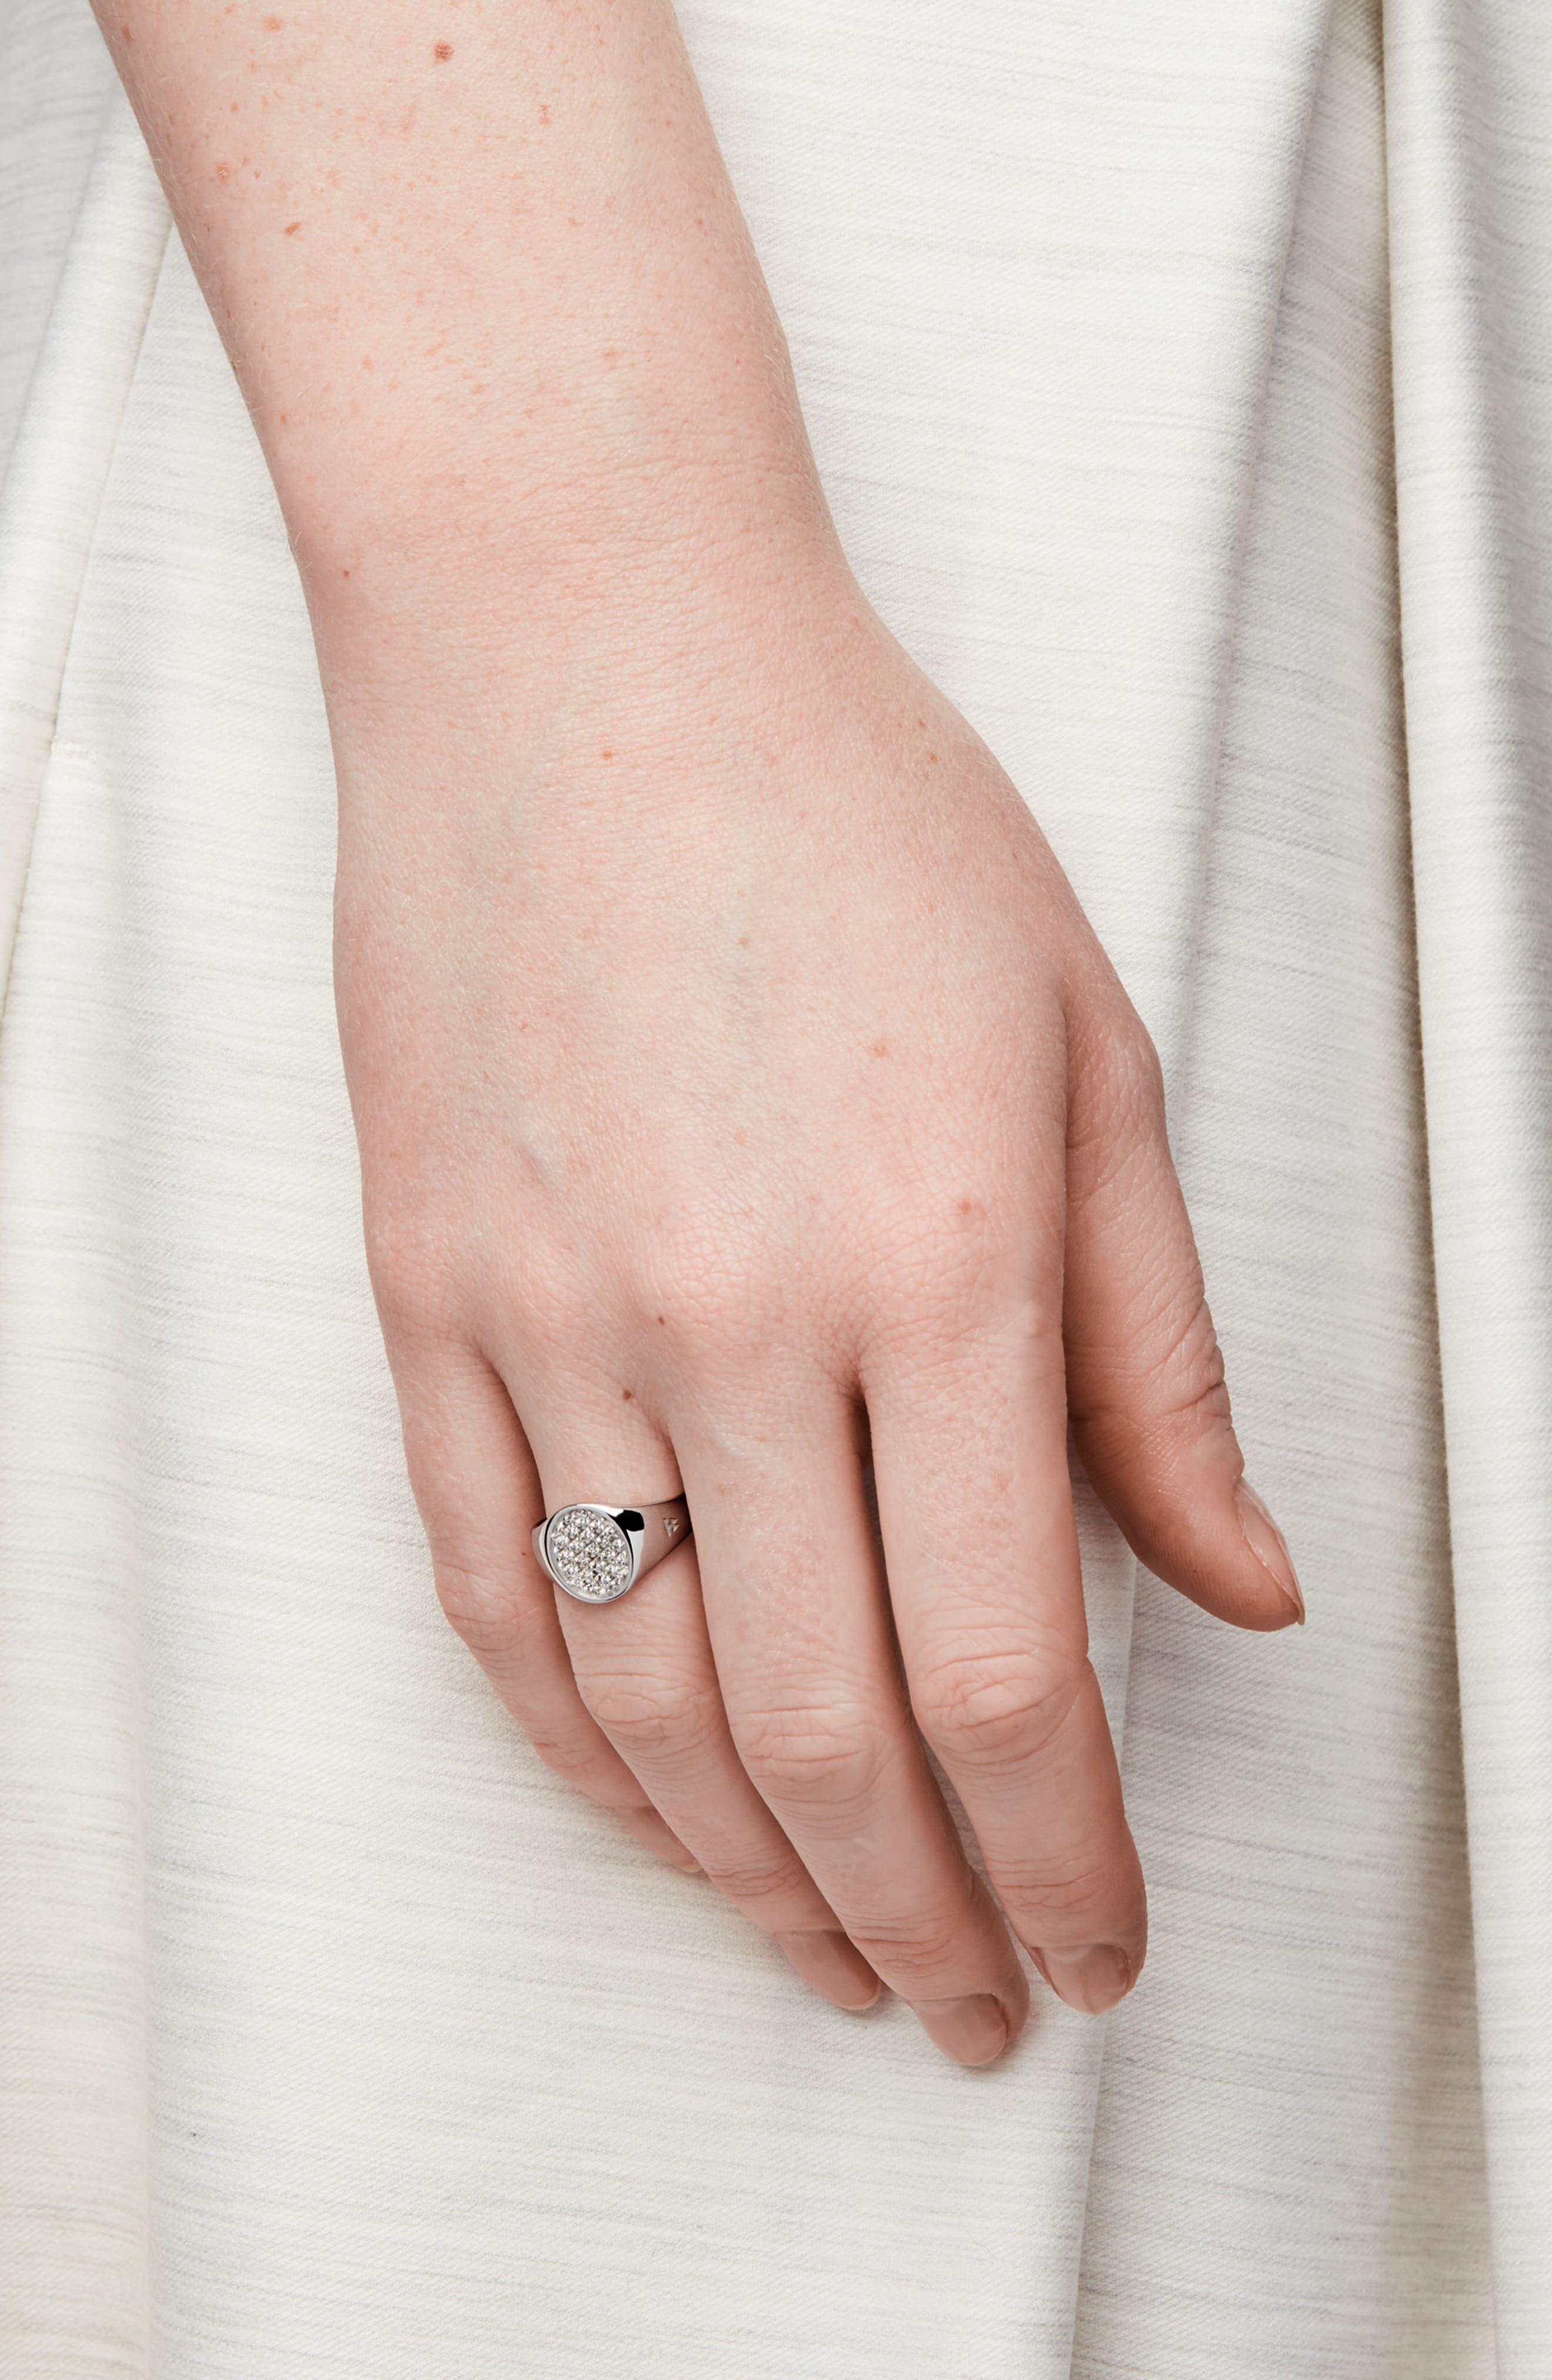 Mini Oval White Topaz Signet Ring,                             Alternate thumbnail 2, color,                             Silver Topaz